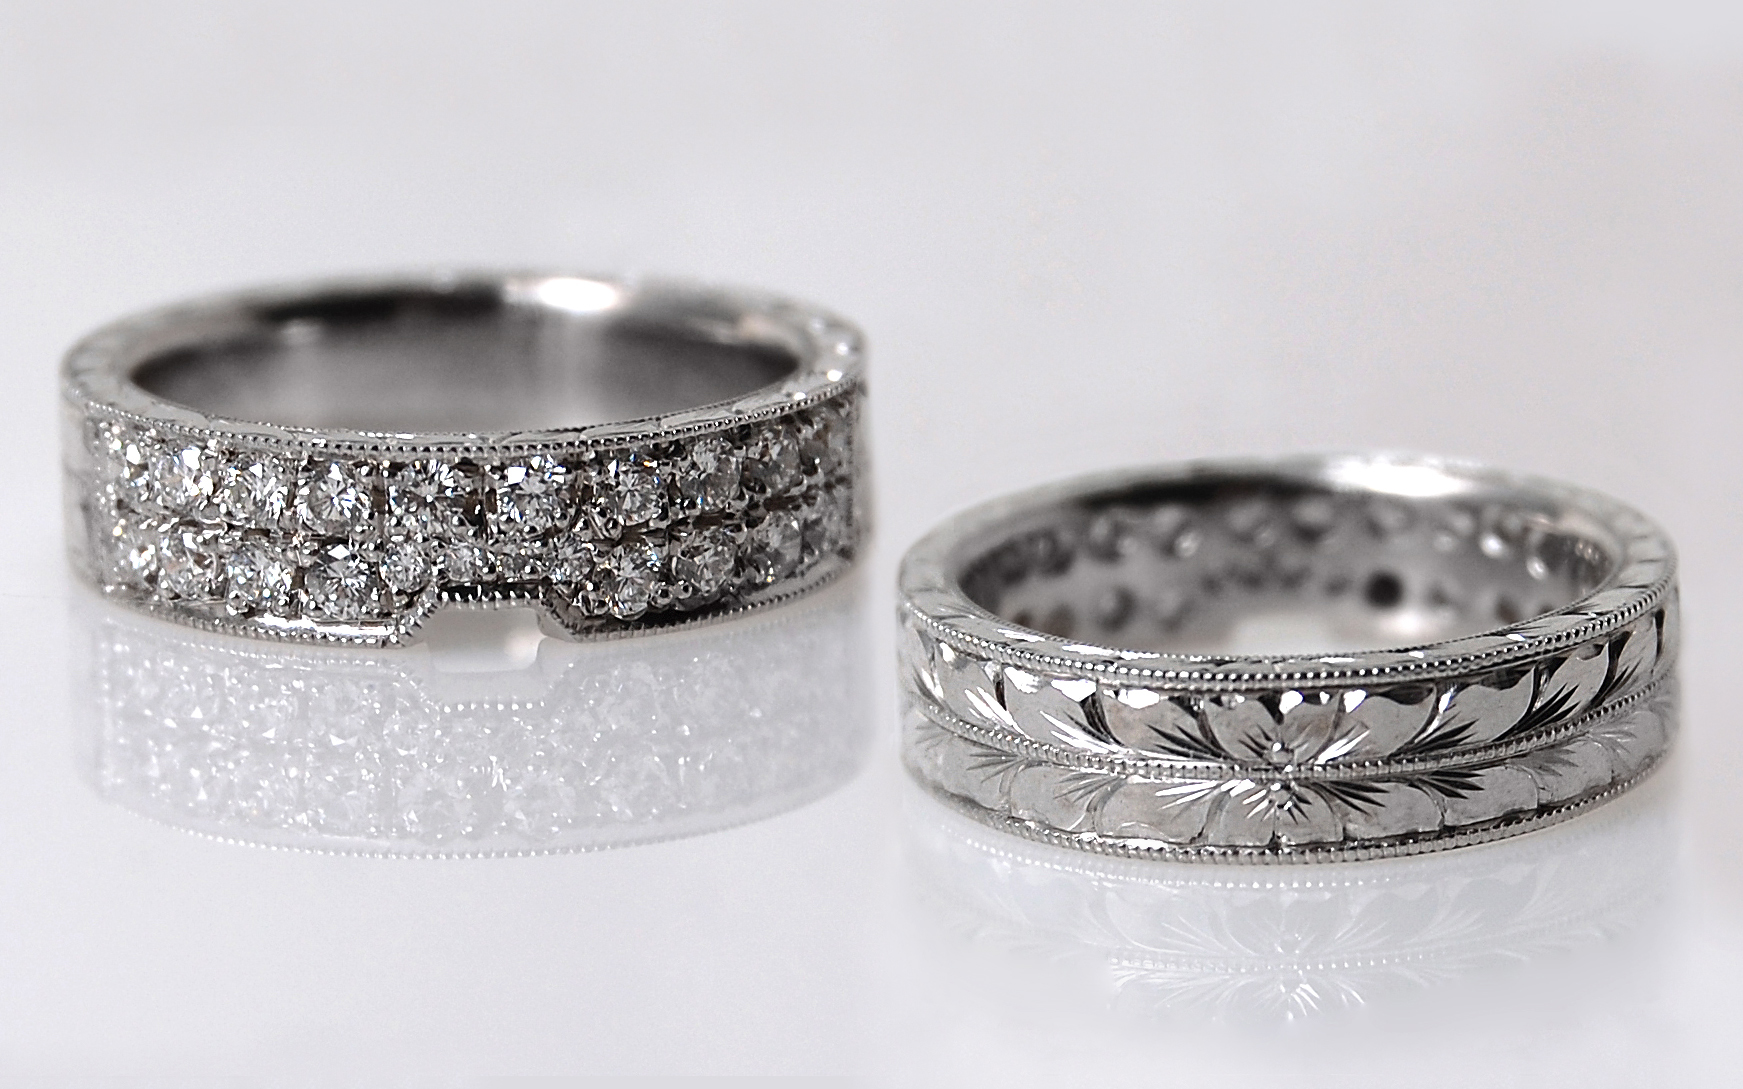 Double Row Bead Set Diamond Hand Engraved Band